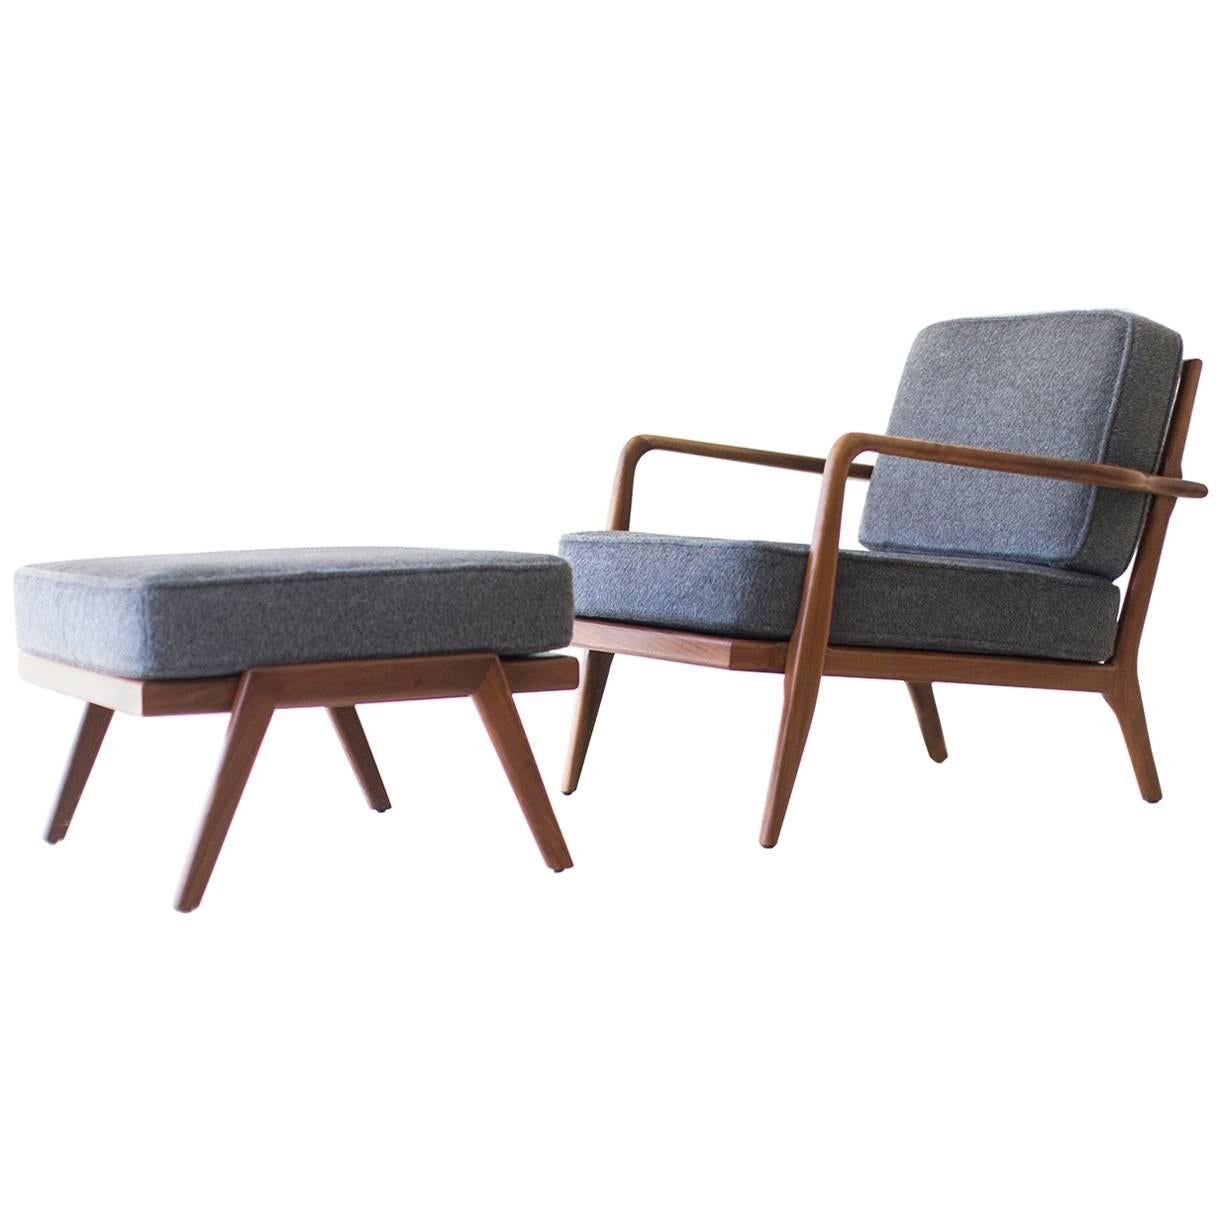 Mel Smilow Lounge Chair and Ottoman for Smilow-Thielle